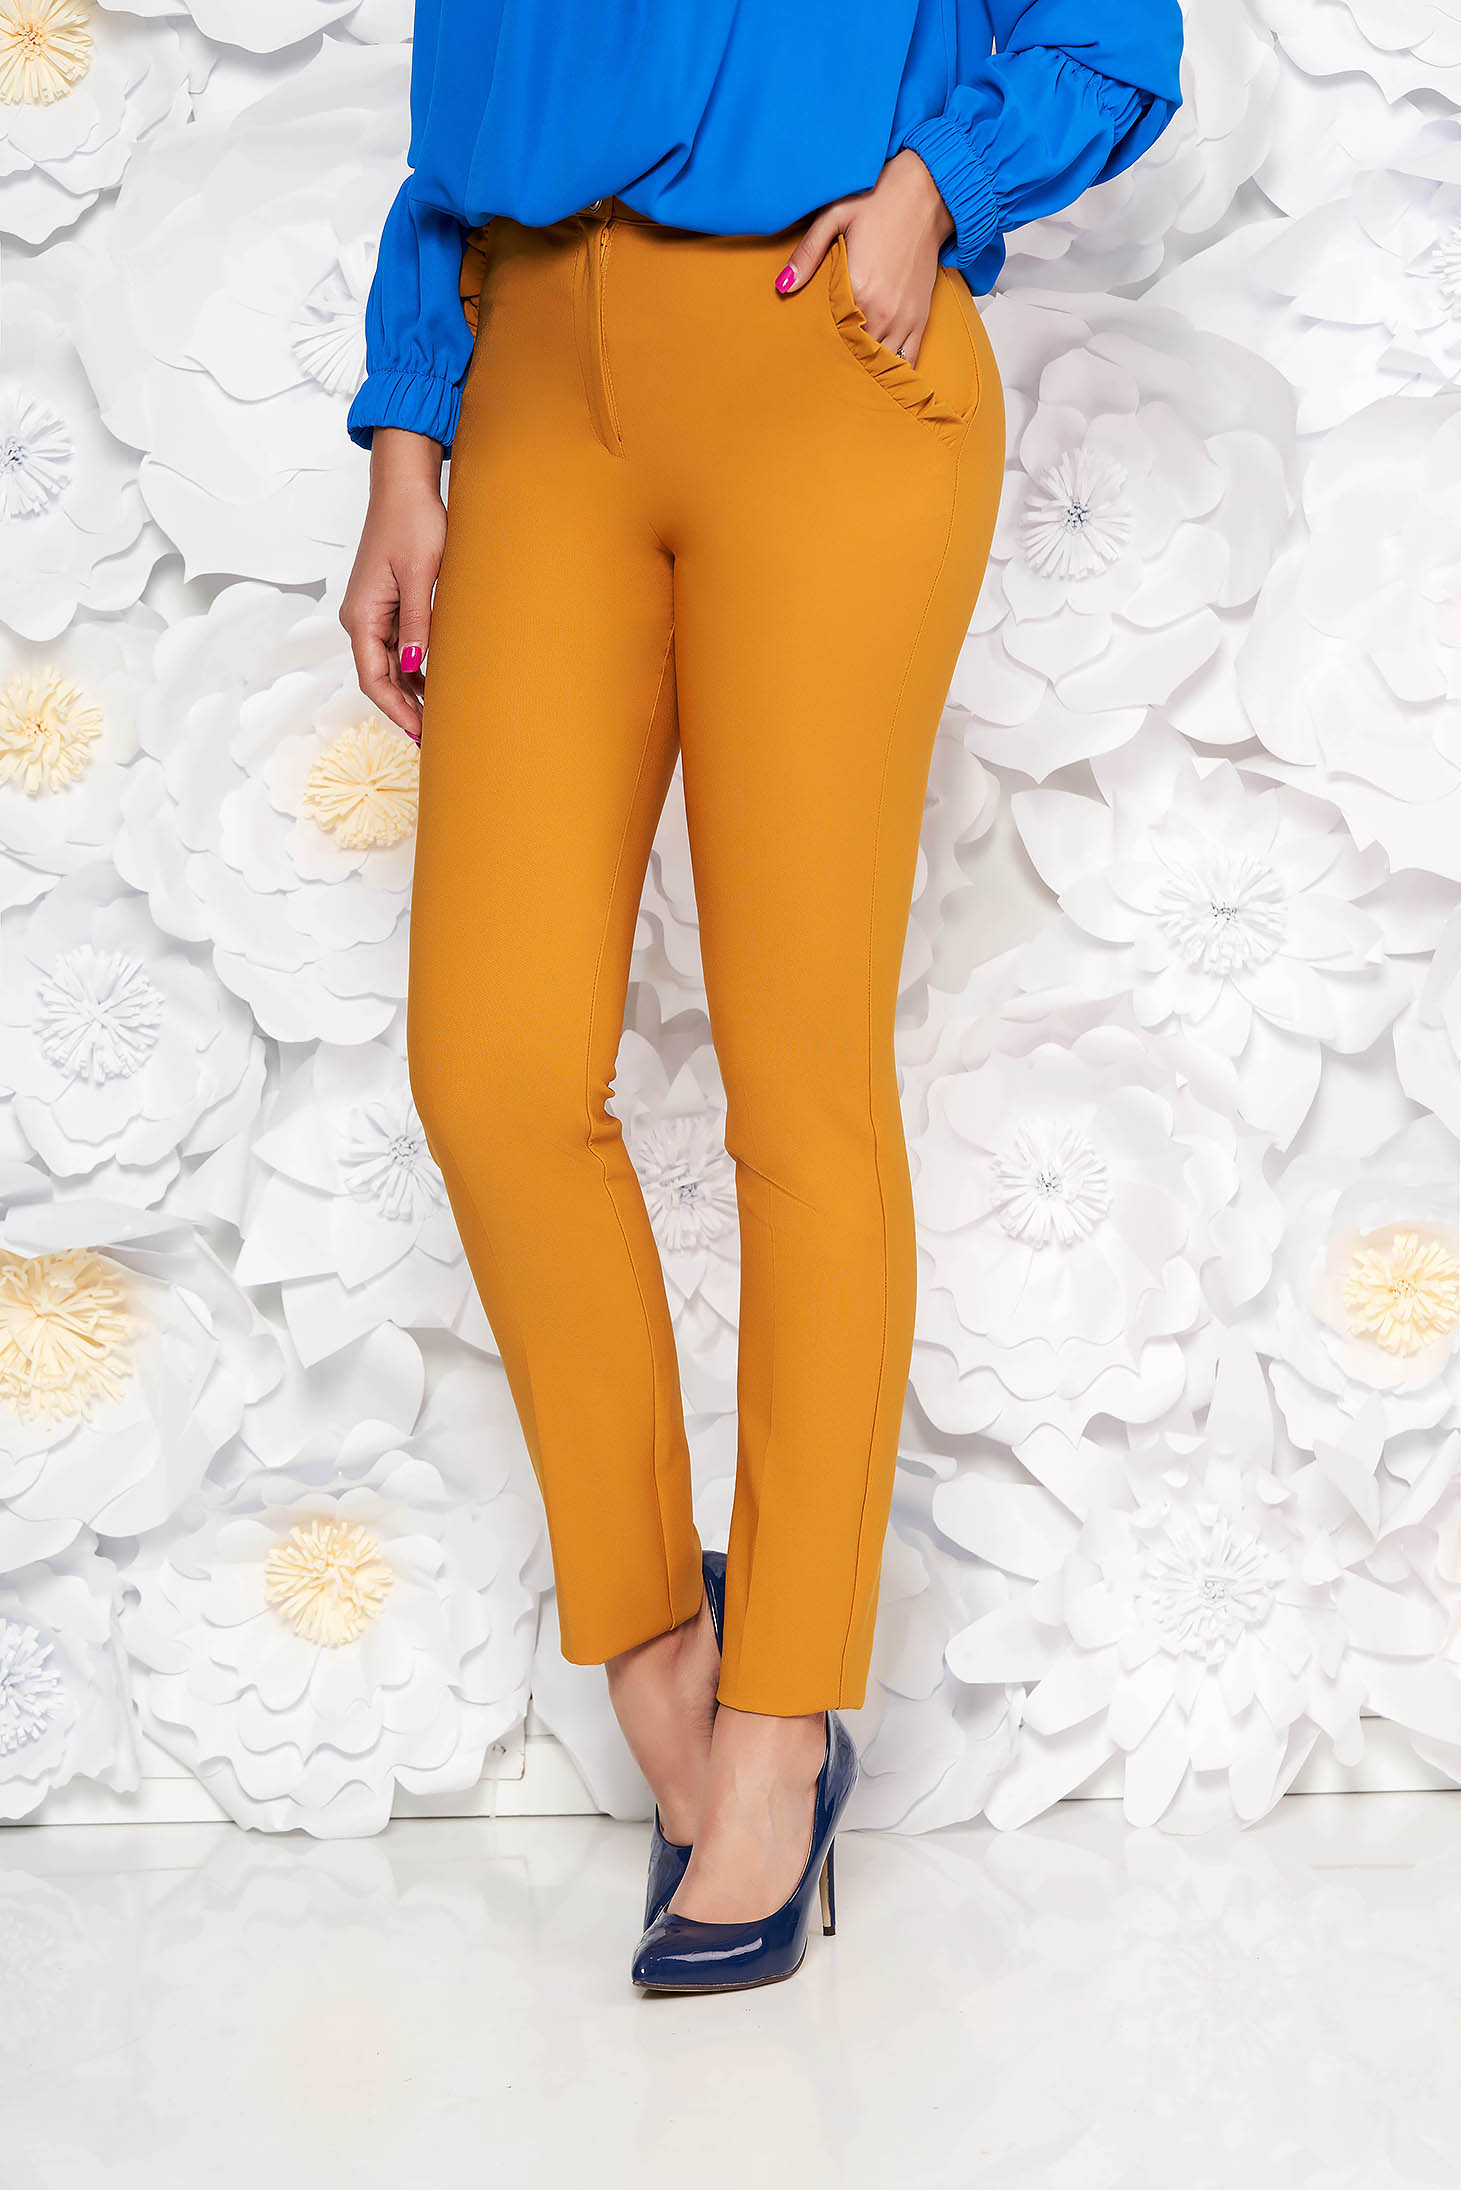 PrettyGirl mustard elegant high waisted trousers slightly elastic fabric with ruffle details